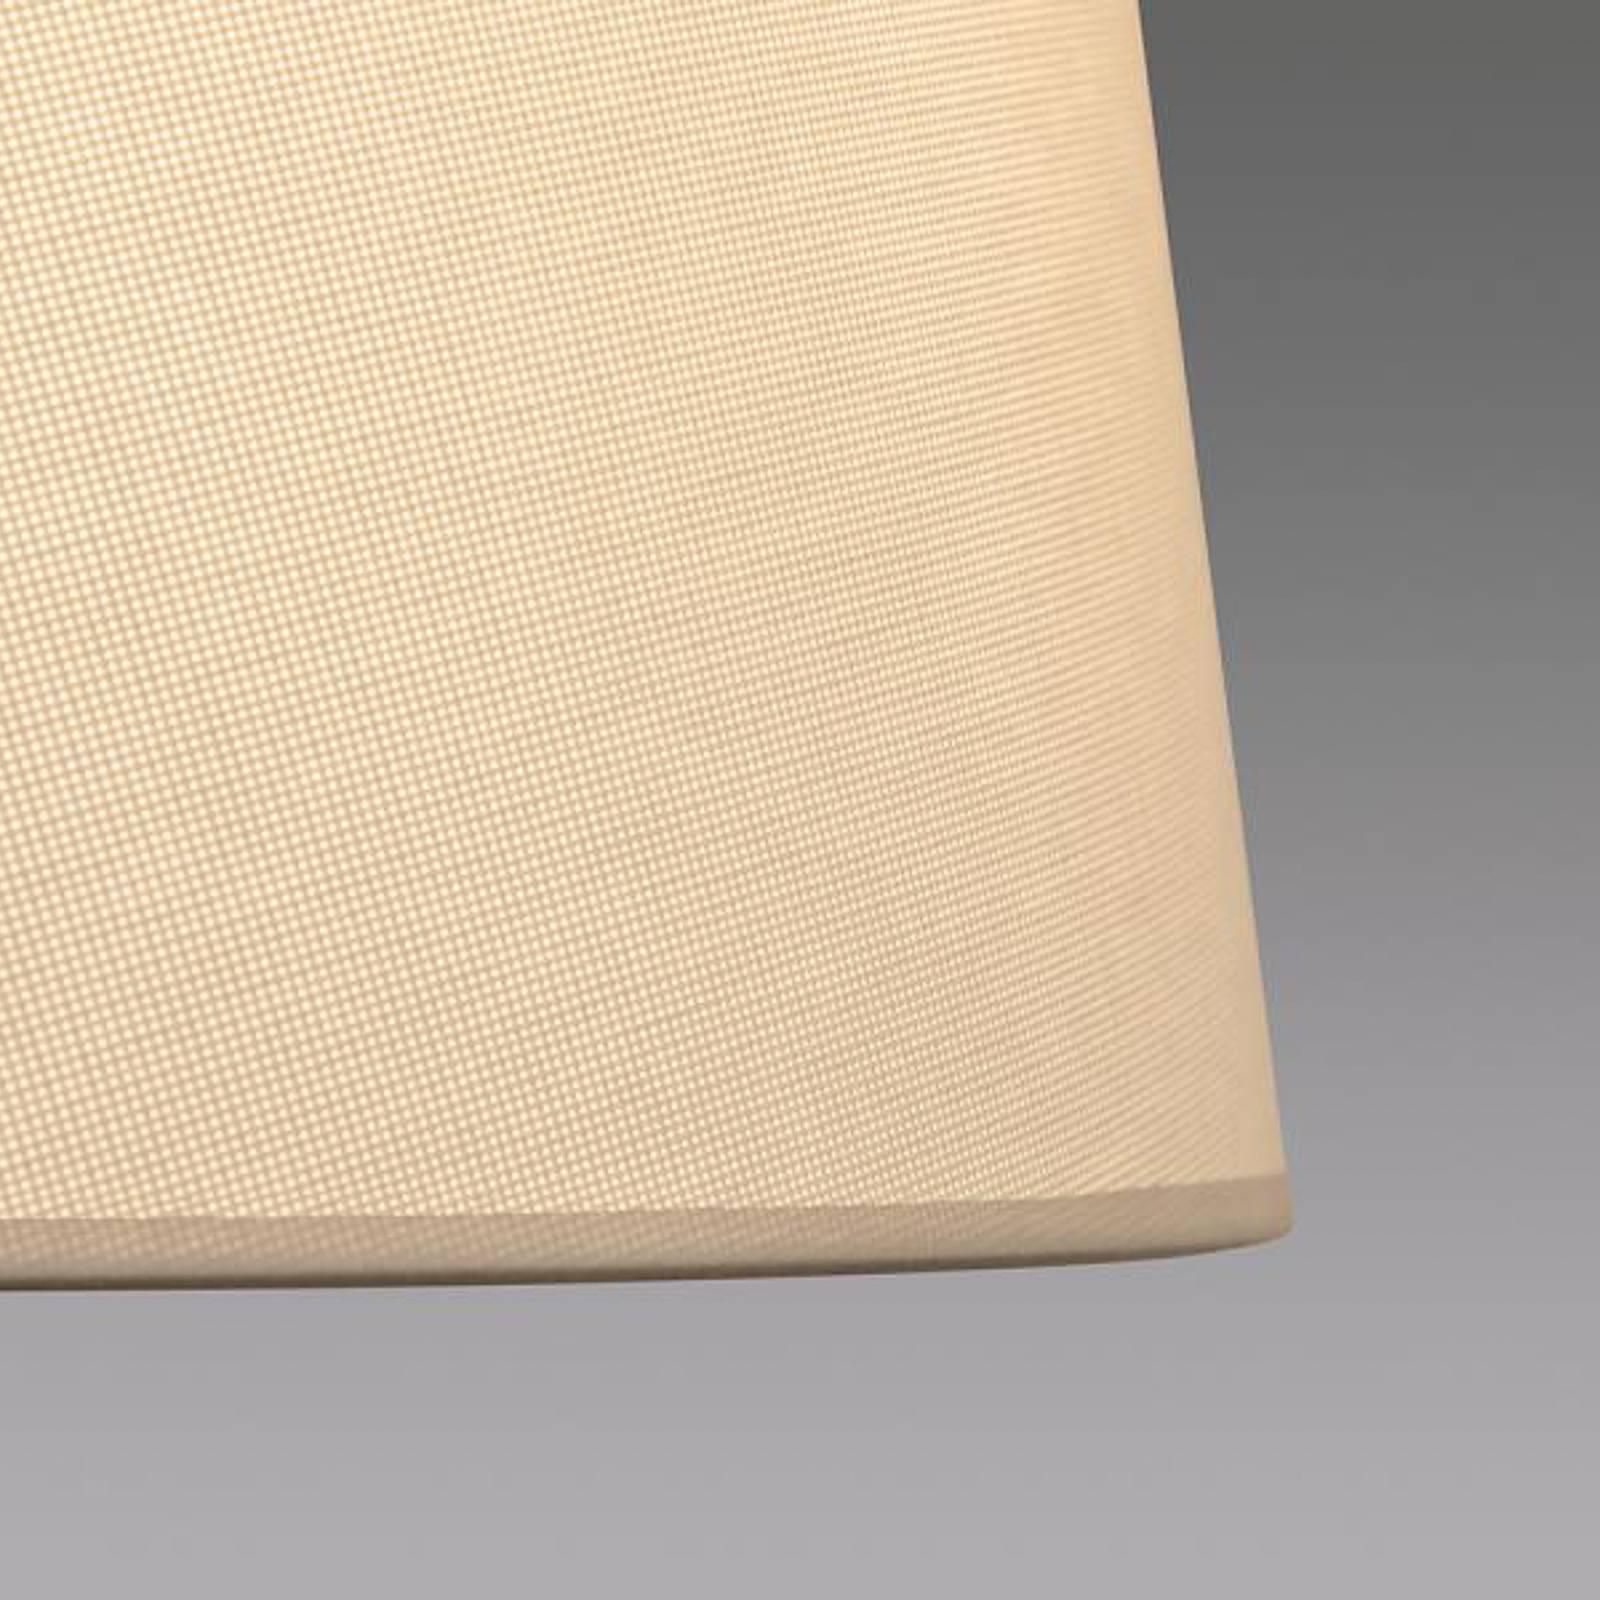 LOUM Bivio Wandleuchte mit Lesearm Schirm grau